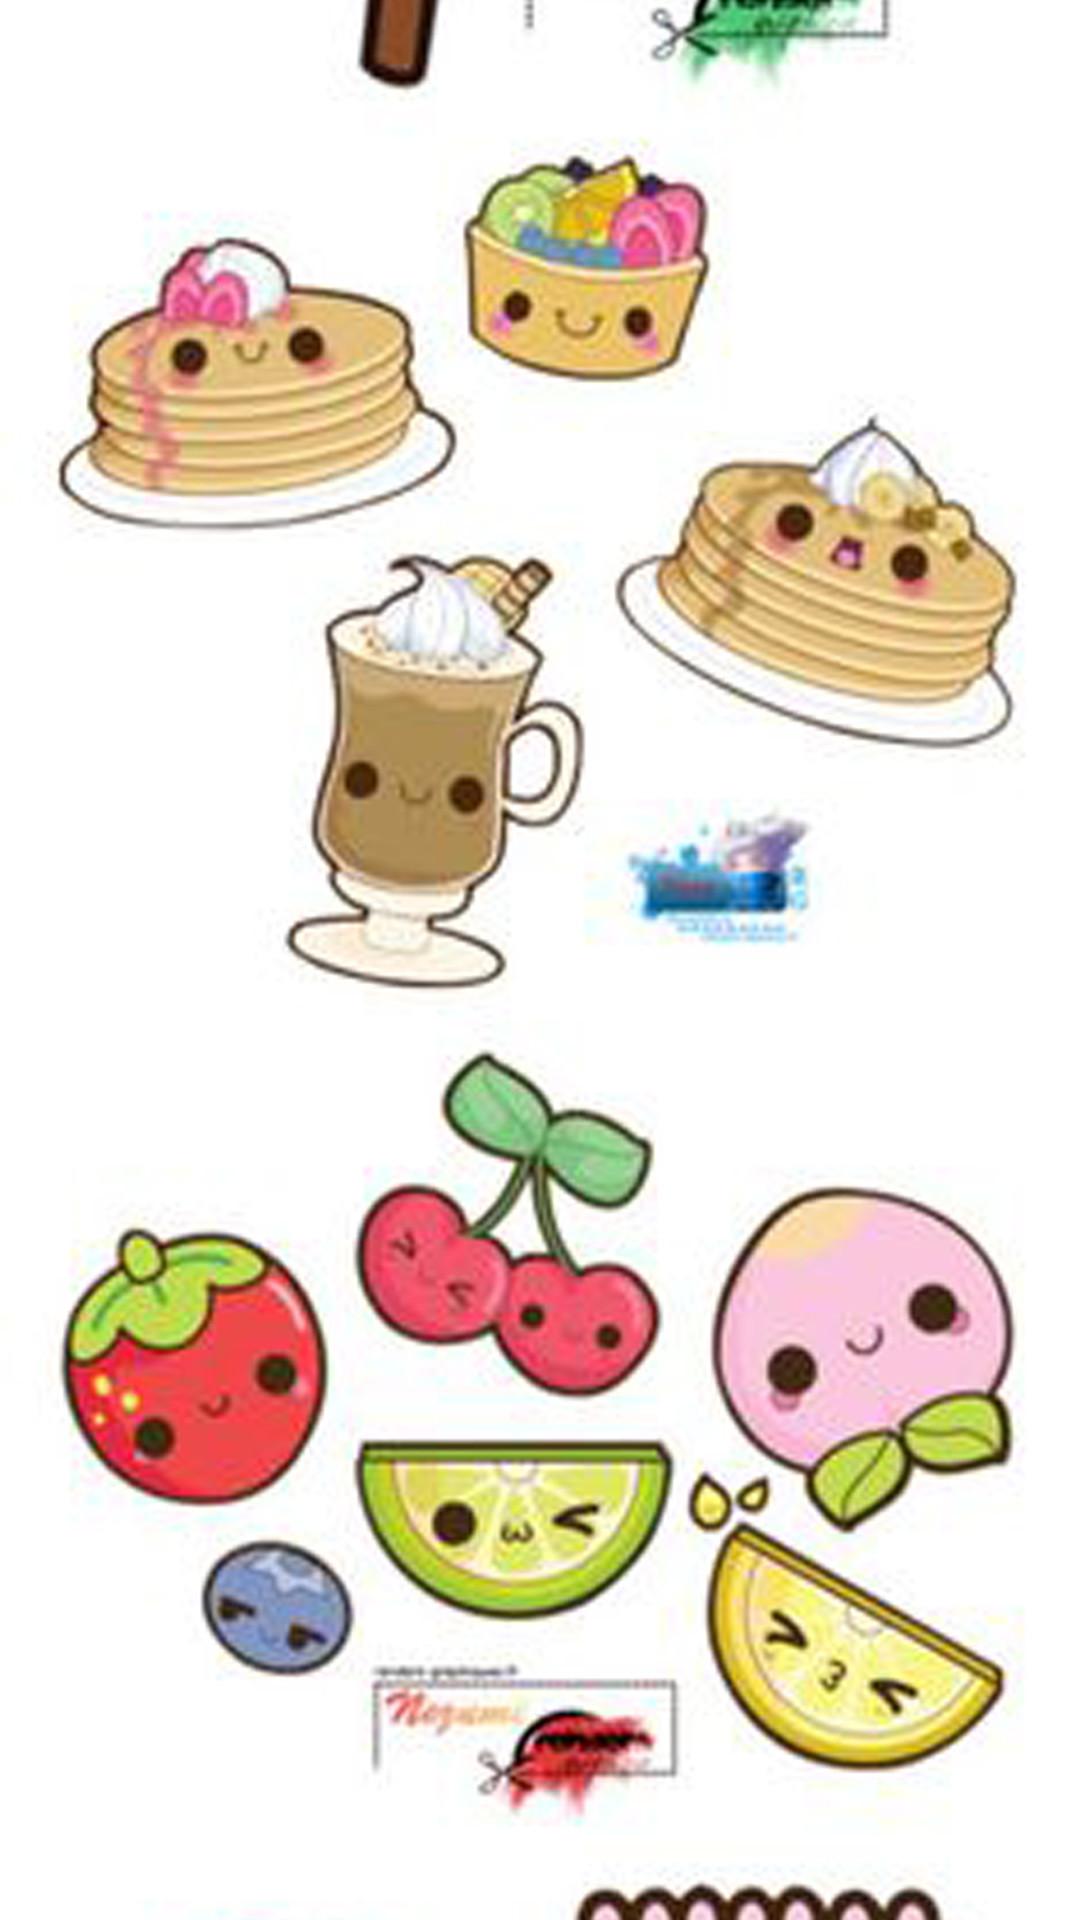 Cute Iphone Wallpaper 86 Images